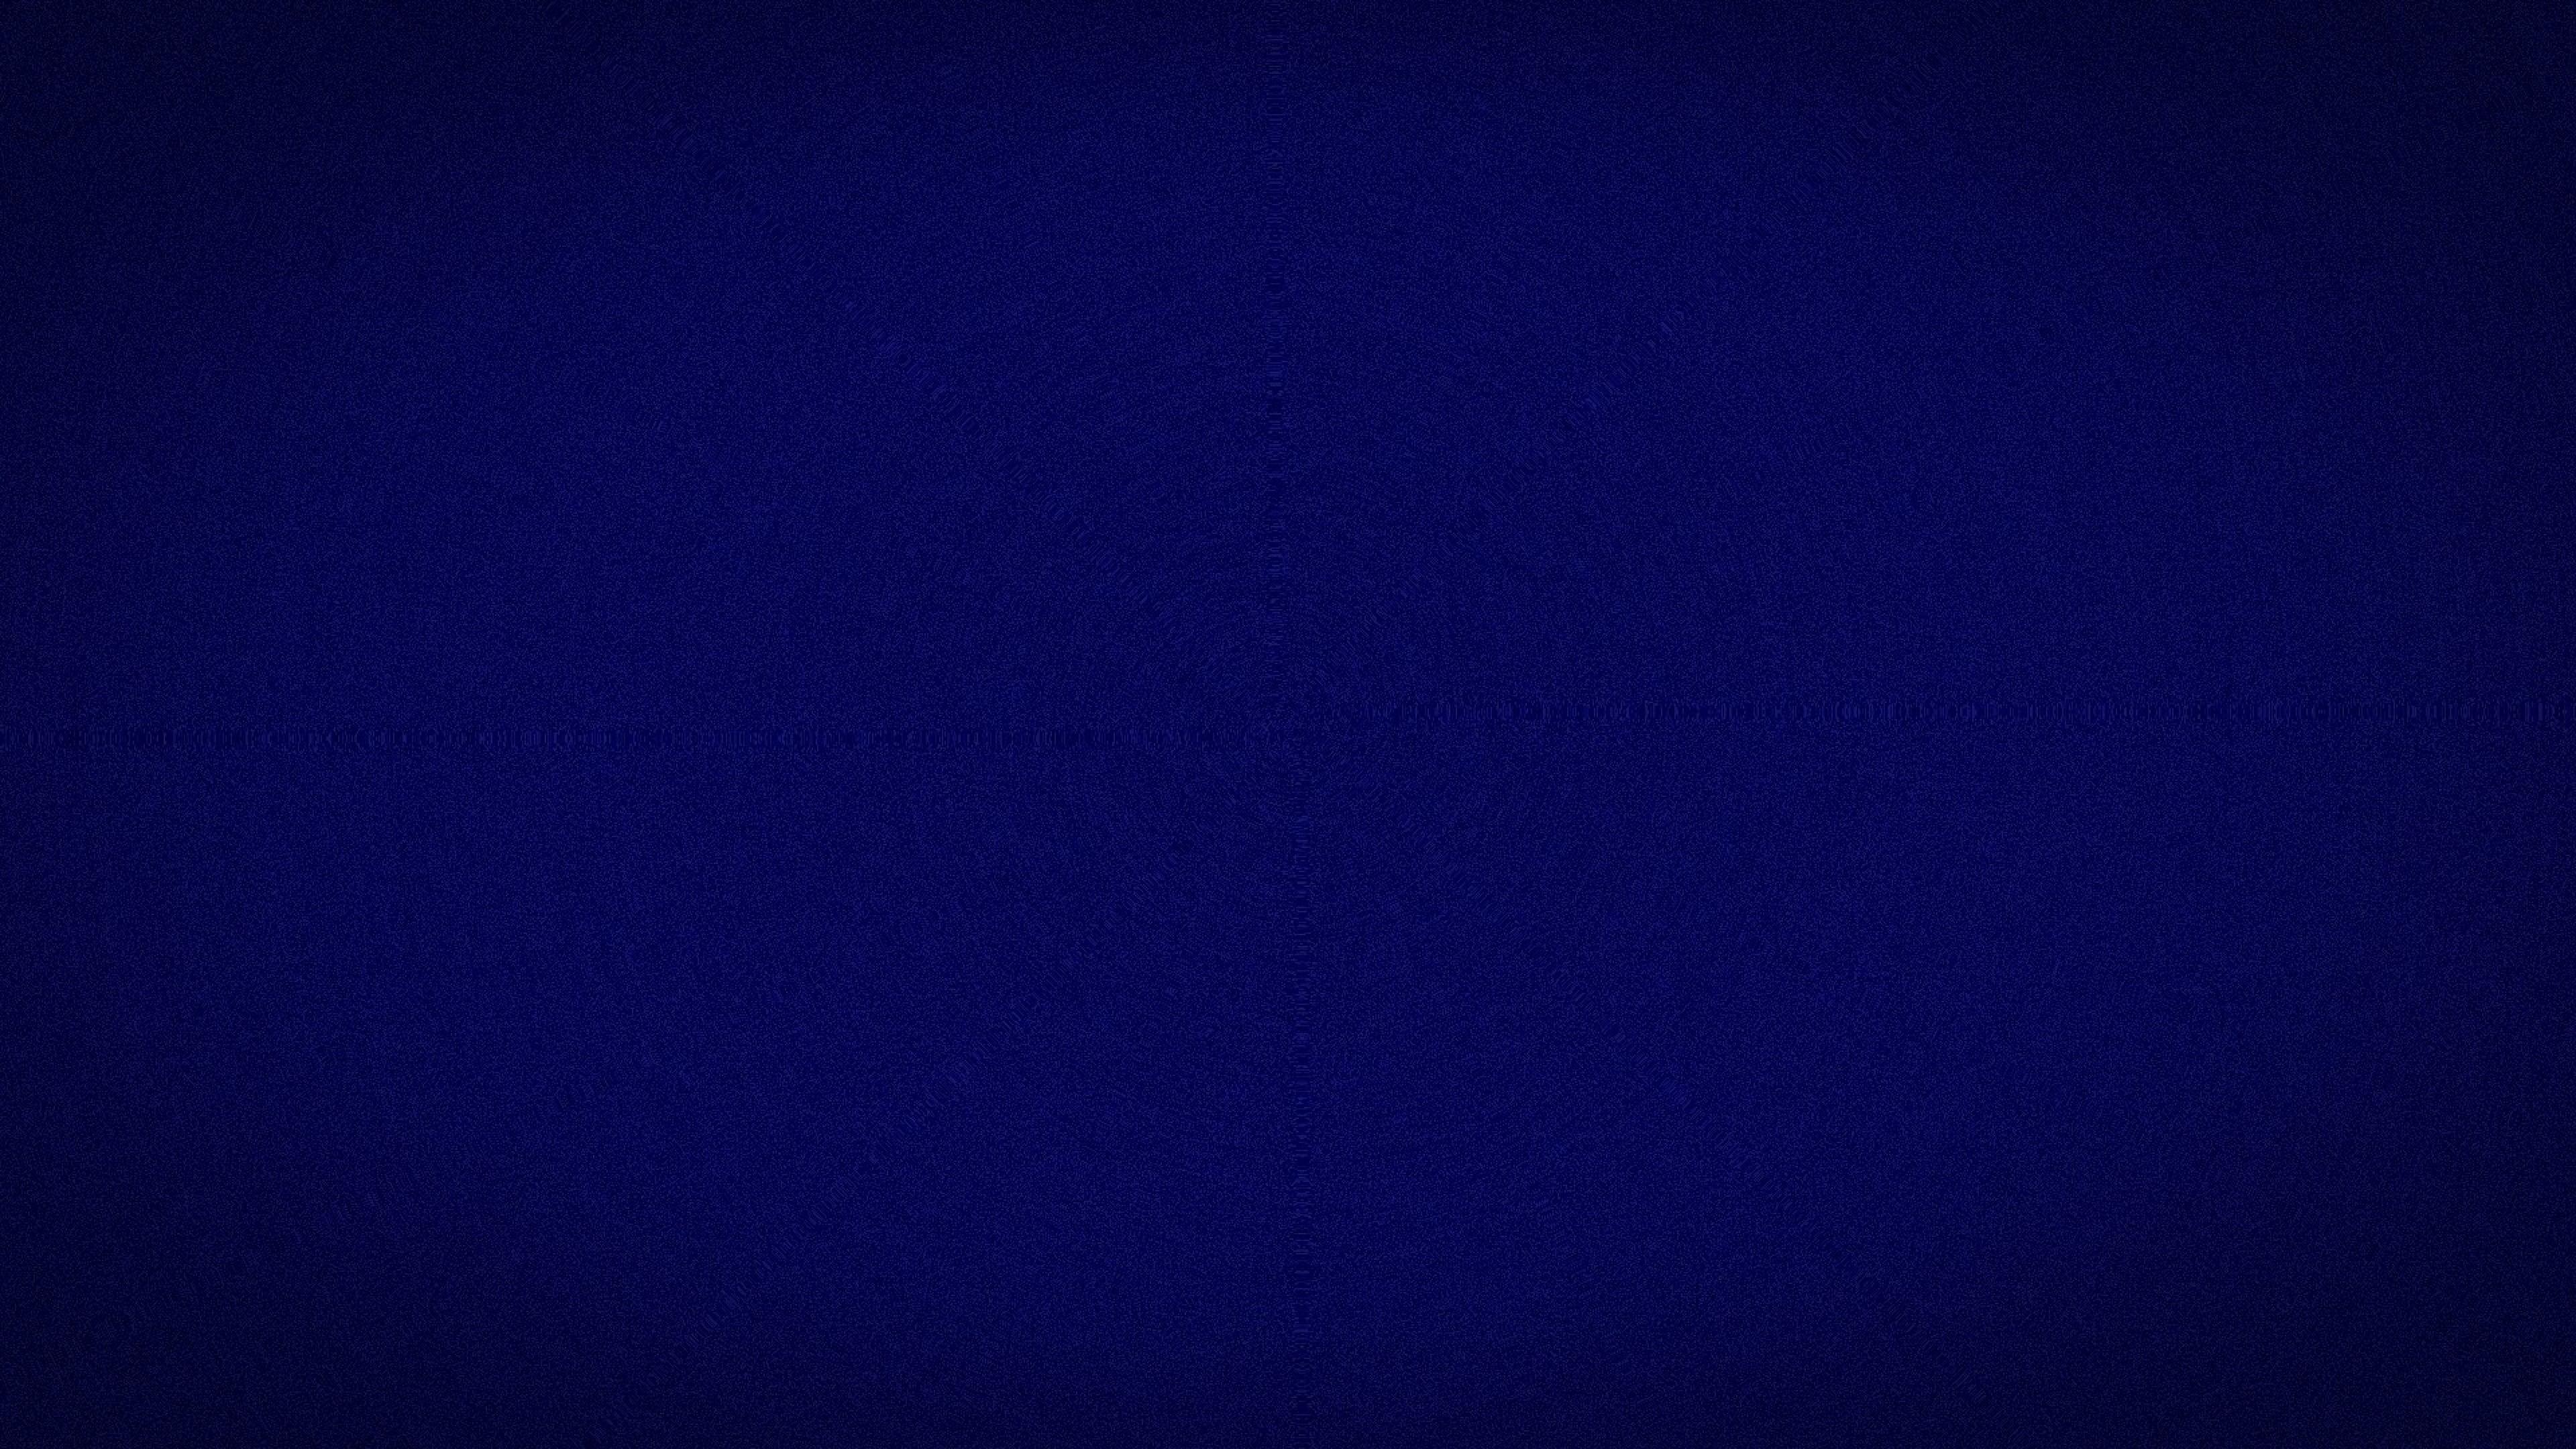 Dark Blue Background Wallpaper Hd Clipartsgram 2536 Parto Sa